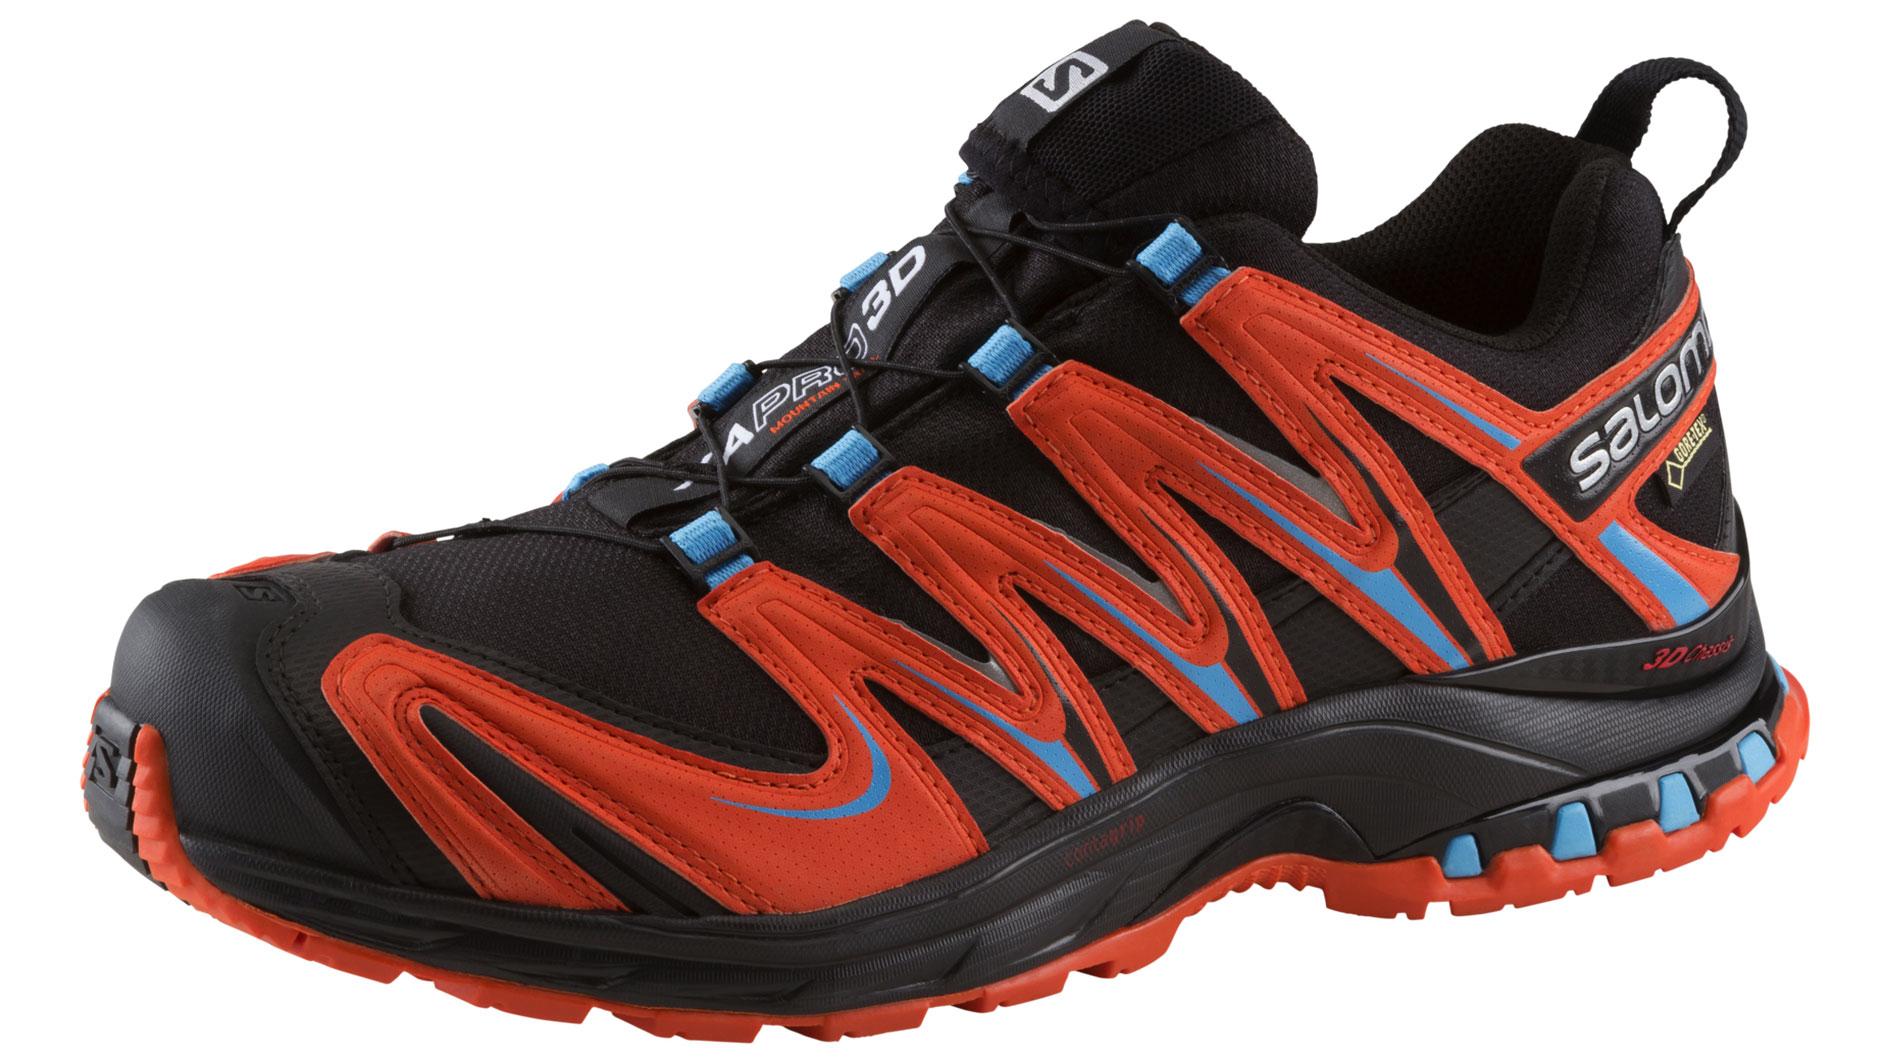 Herren Trailrunning-Schuhe XA PRO 3D GTX